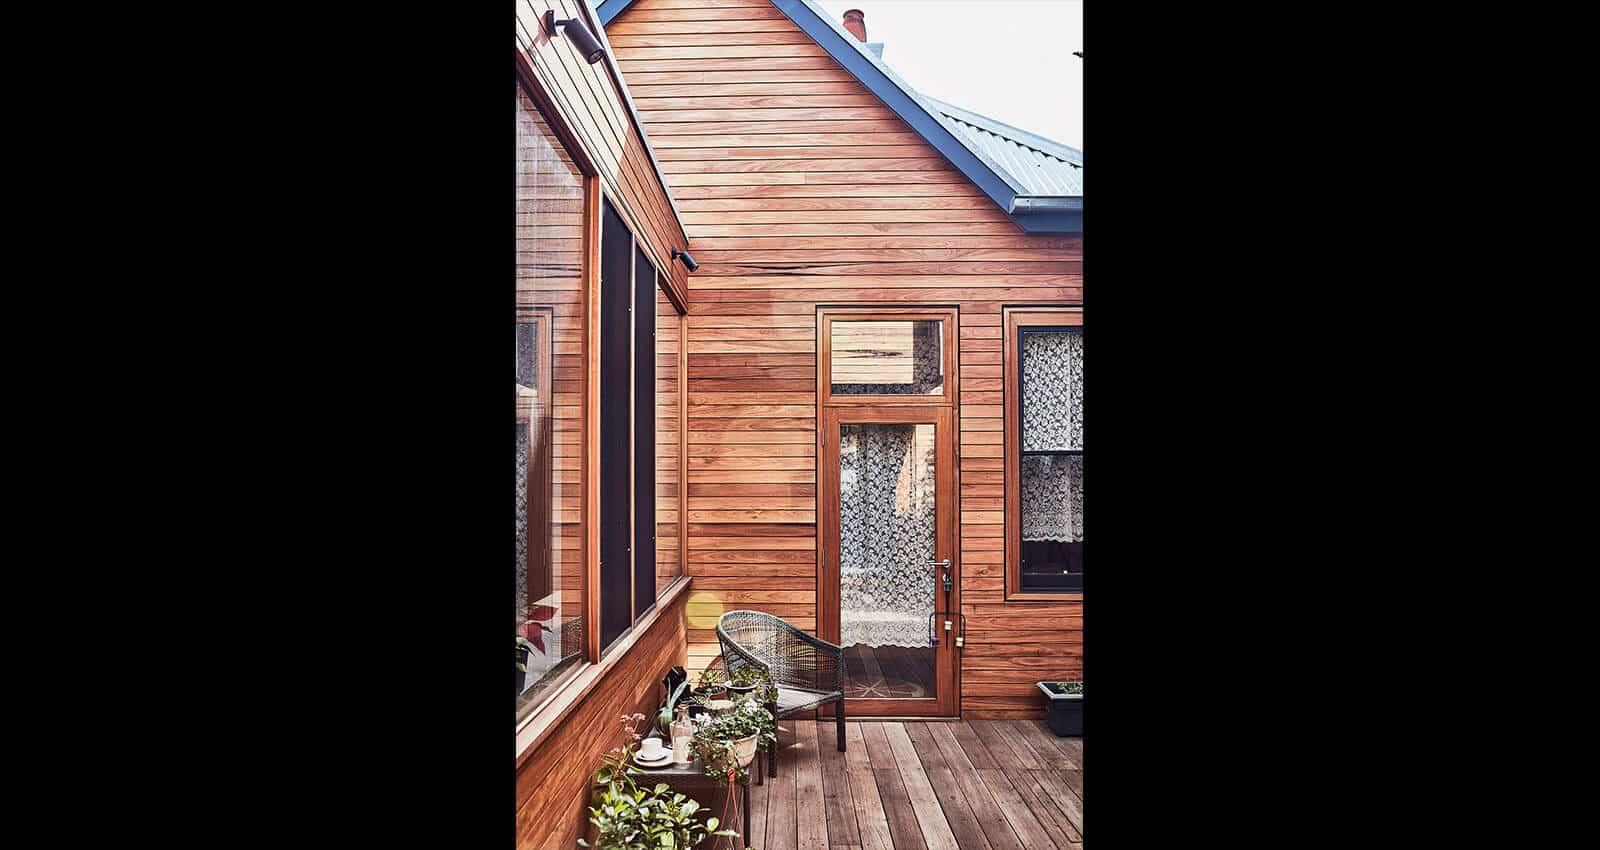 Glenlyon Rd home exterior decking